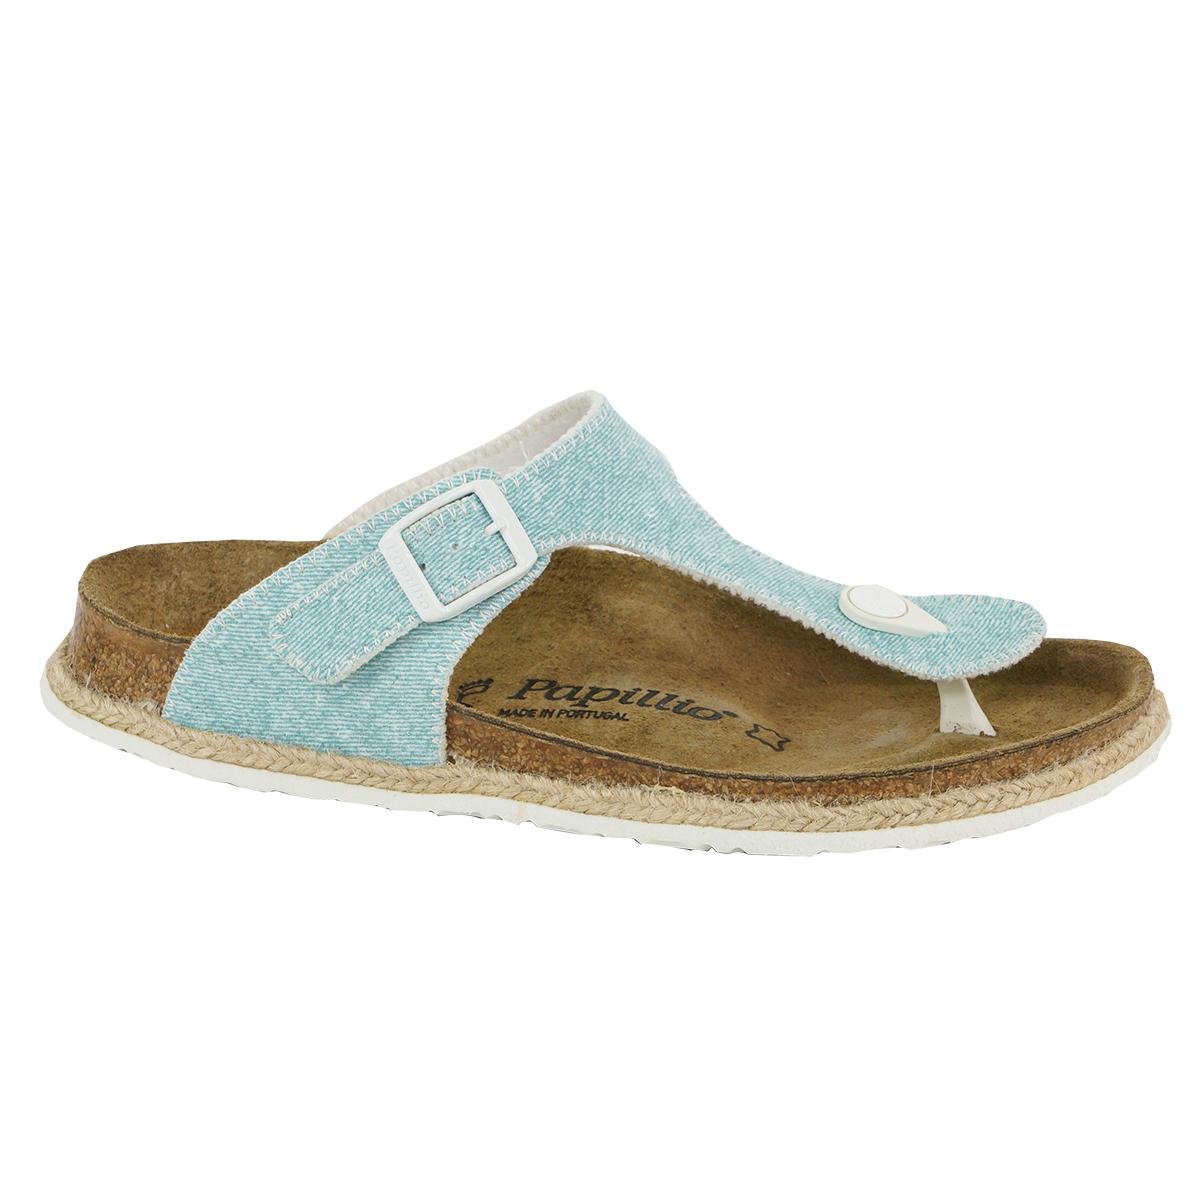 Details about Birkenstock Papillio Women's Gizeh Sandals Birko Flor Beach Light Blue 36